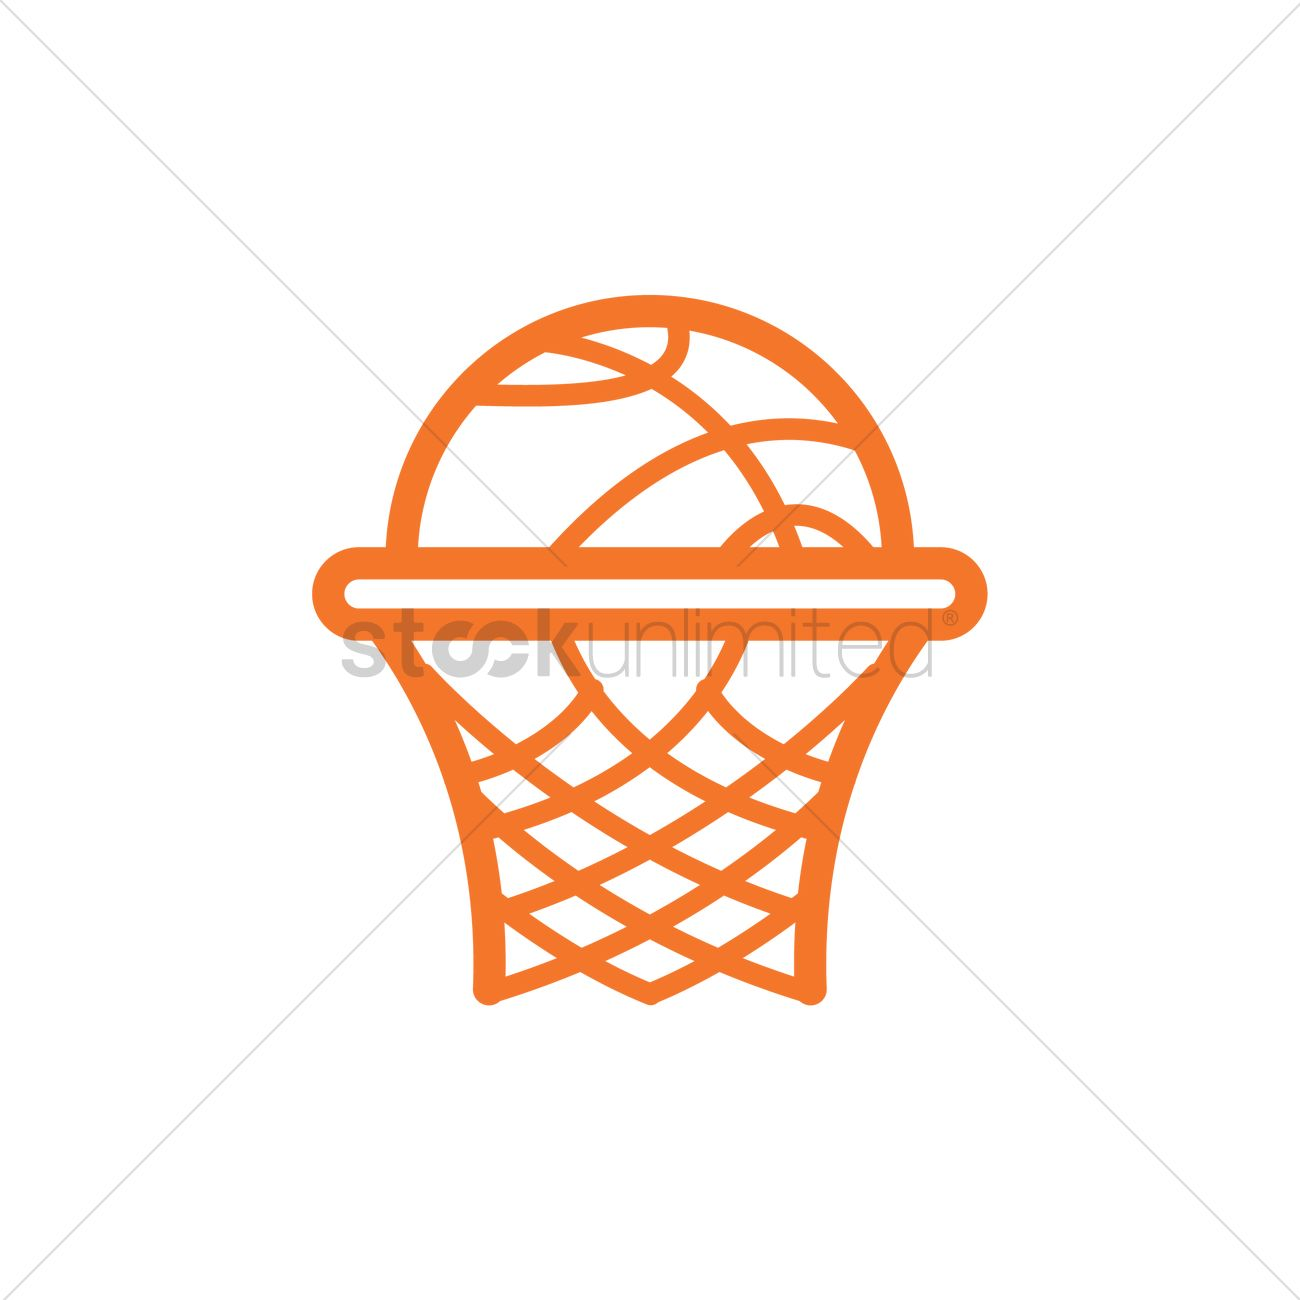 https://images.cdn3.stockunlimited.net/preview1300/basketball-hoop_2022617.jpg Basketball